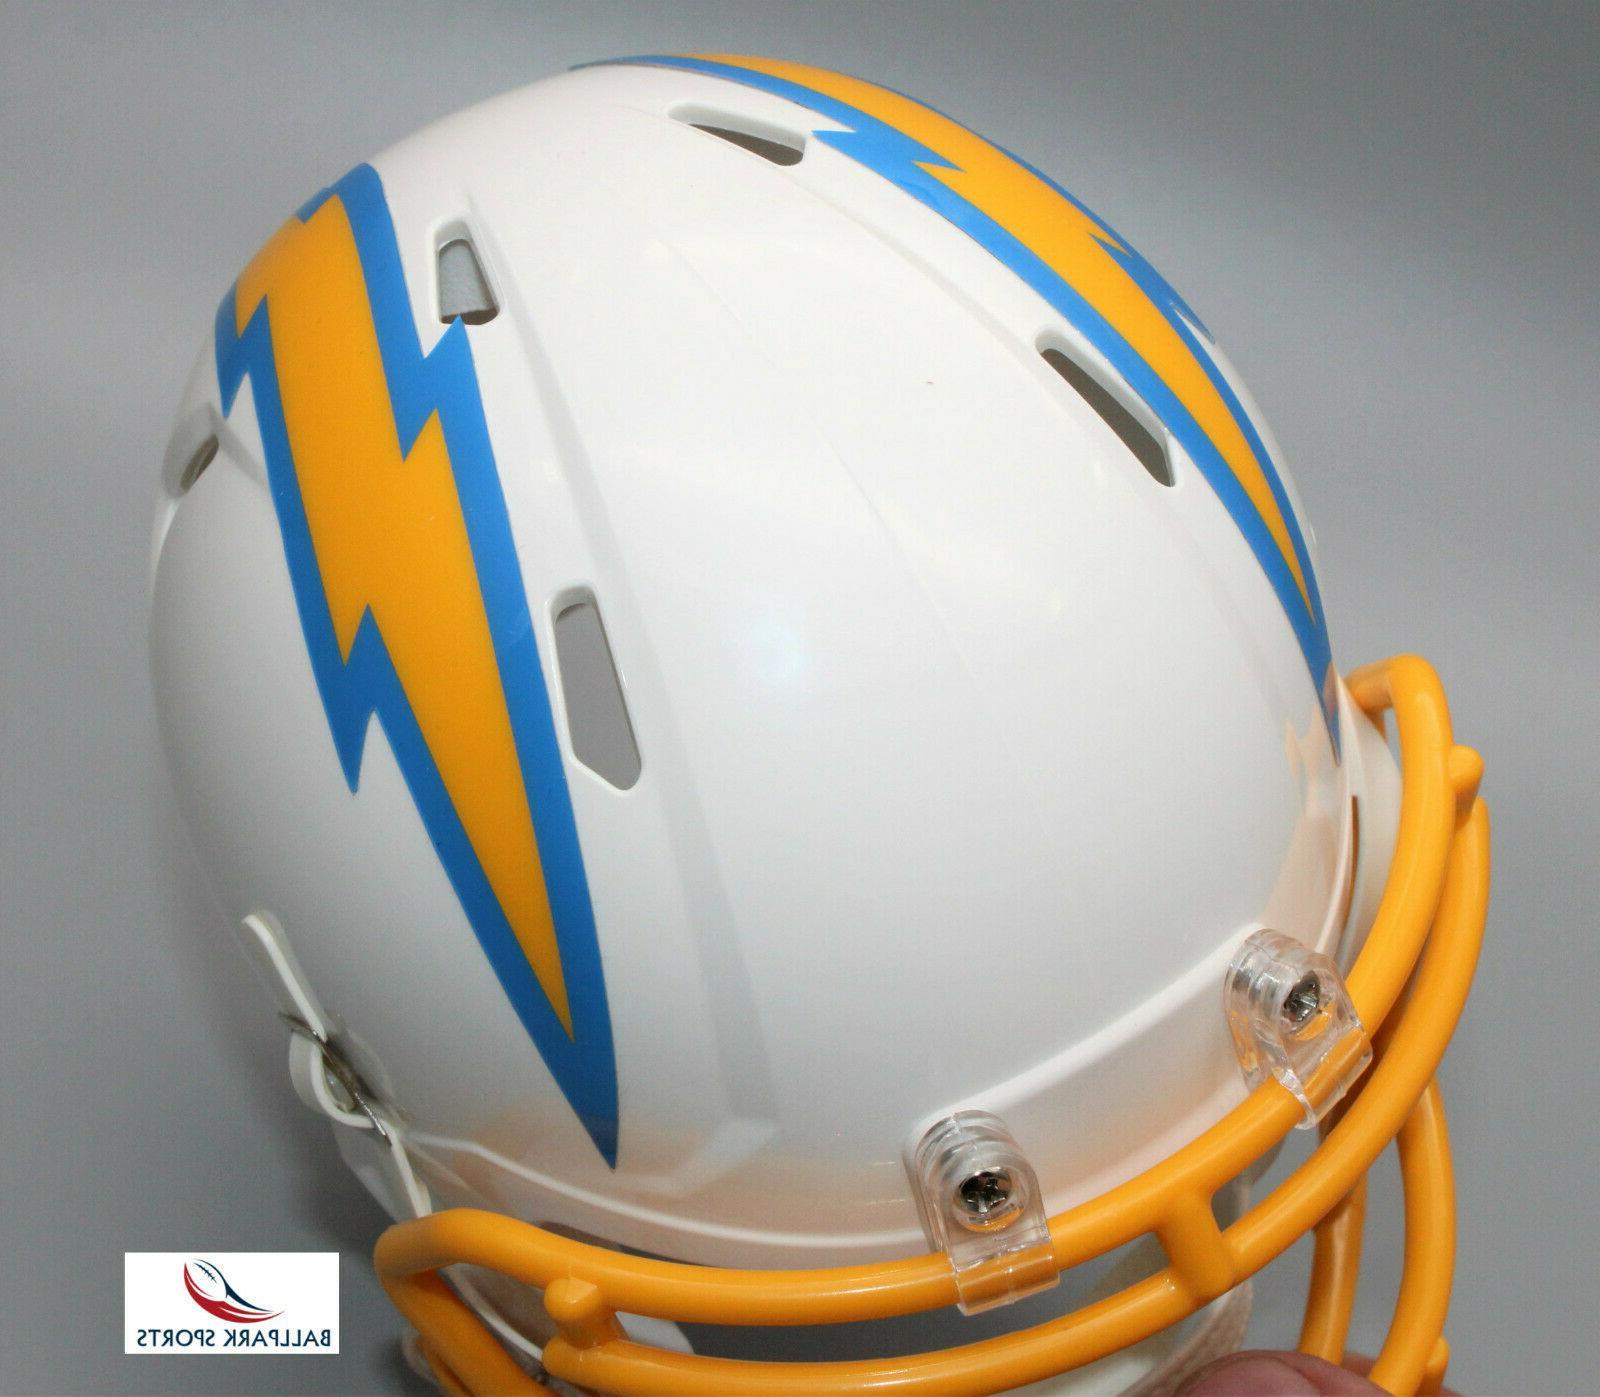 LOS CHARGERS Riddell Mini Helmet 2020